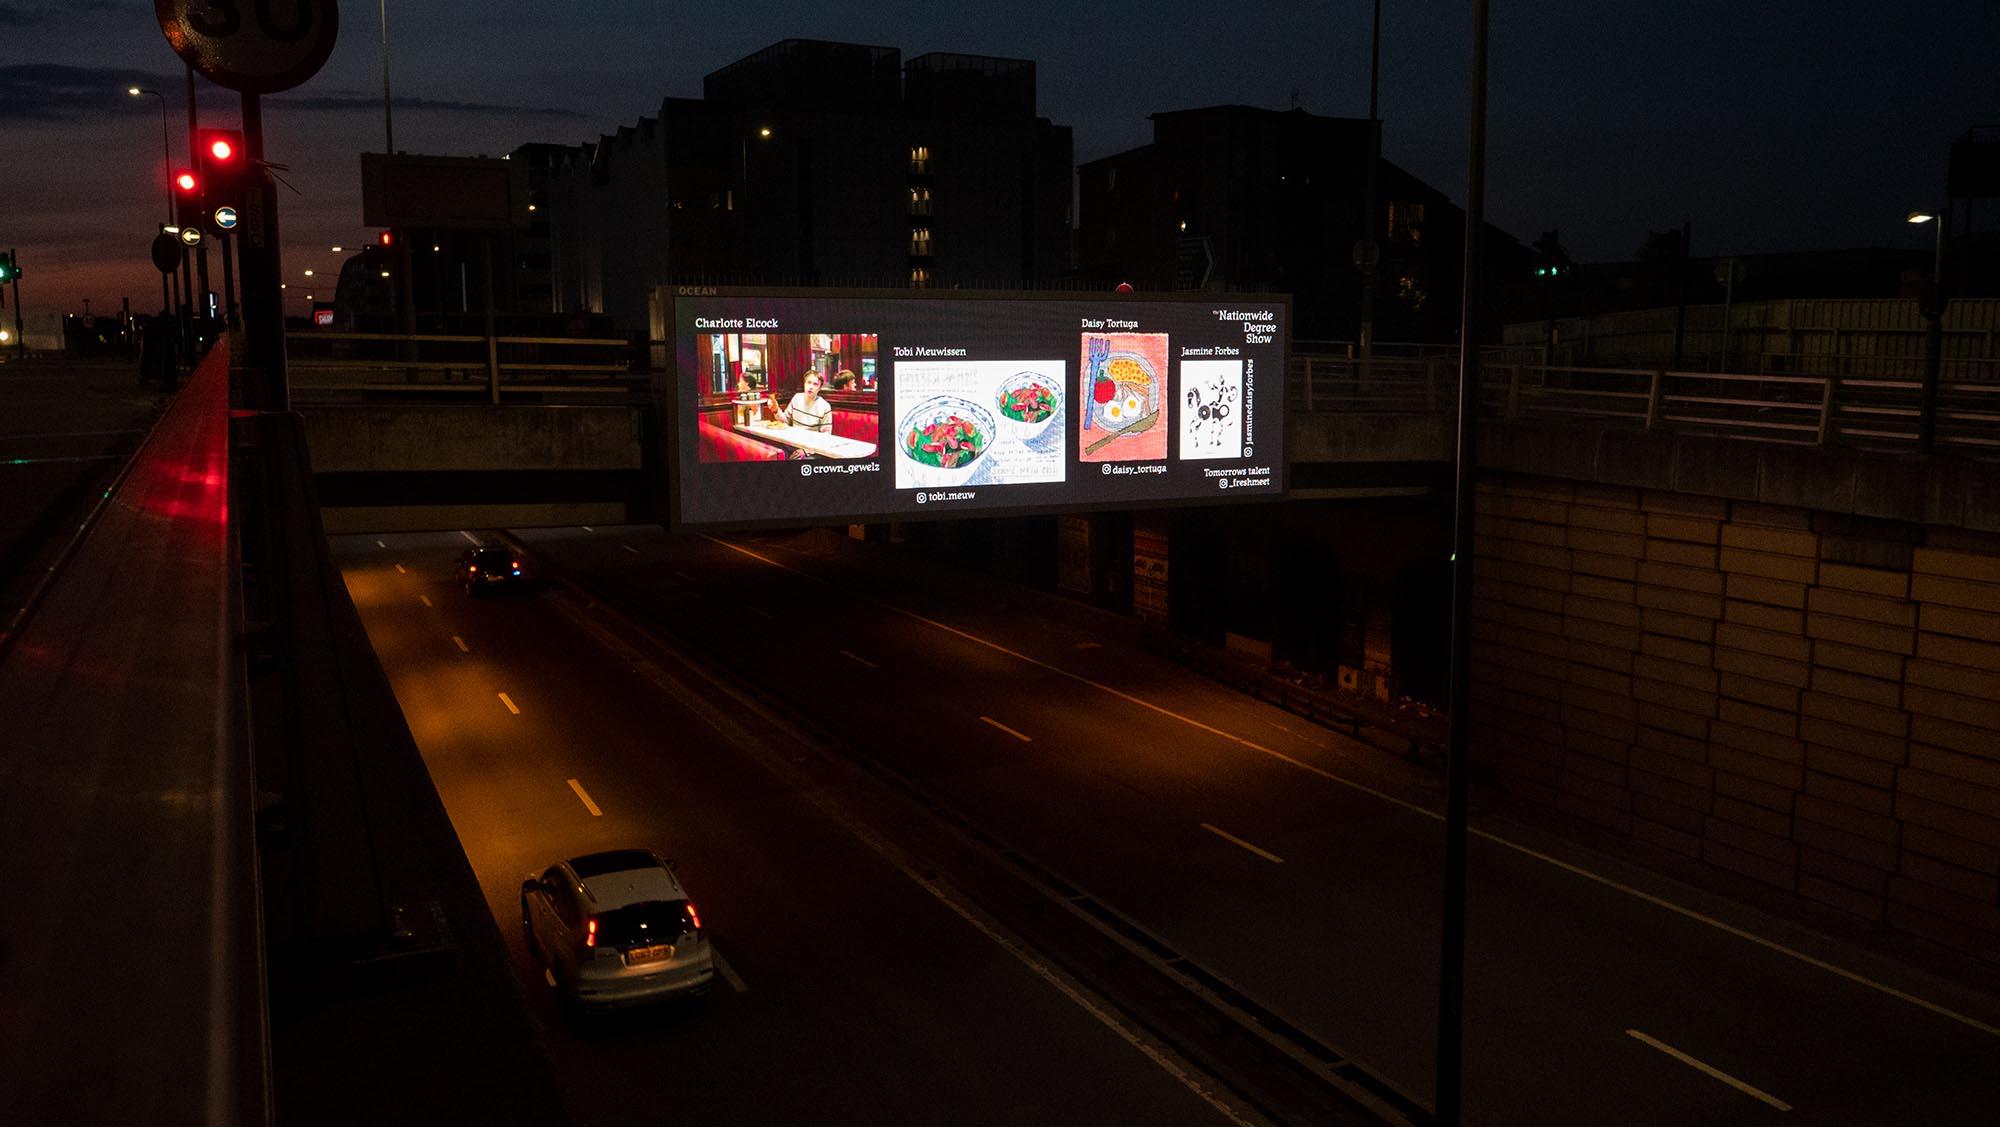 Billboard showing graduate work at night